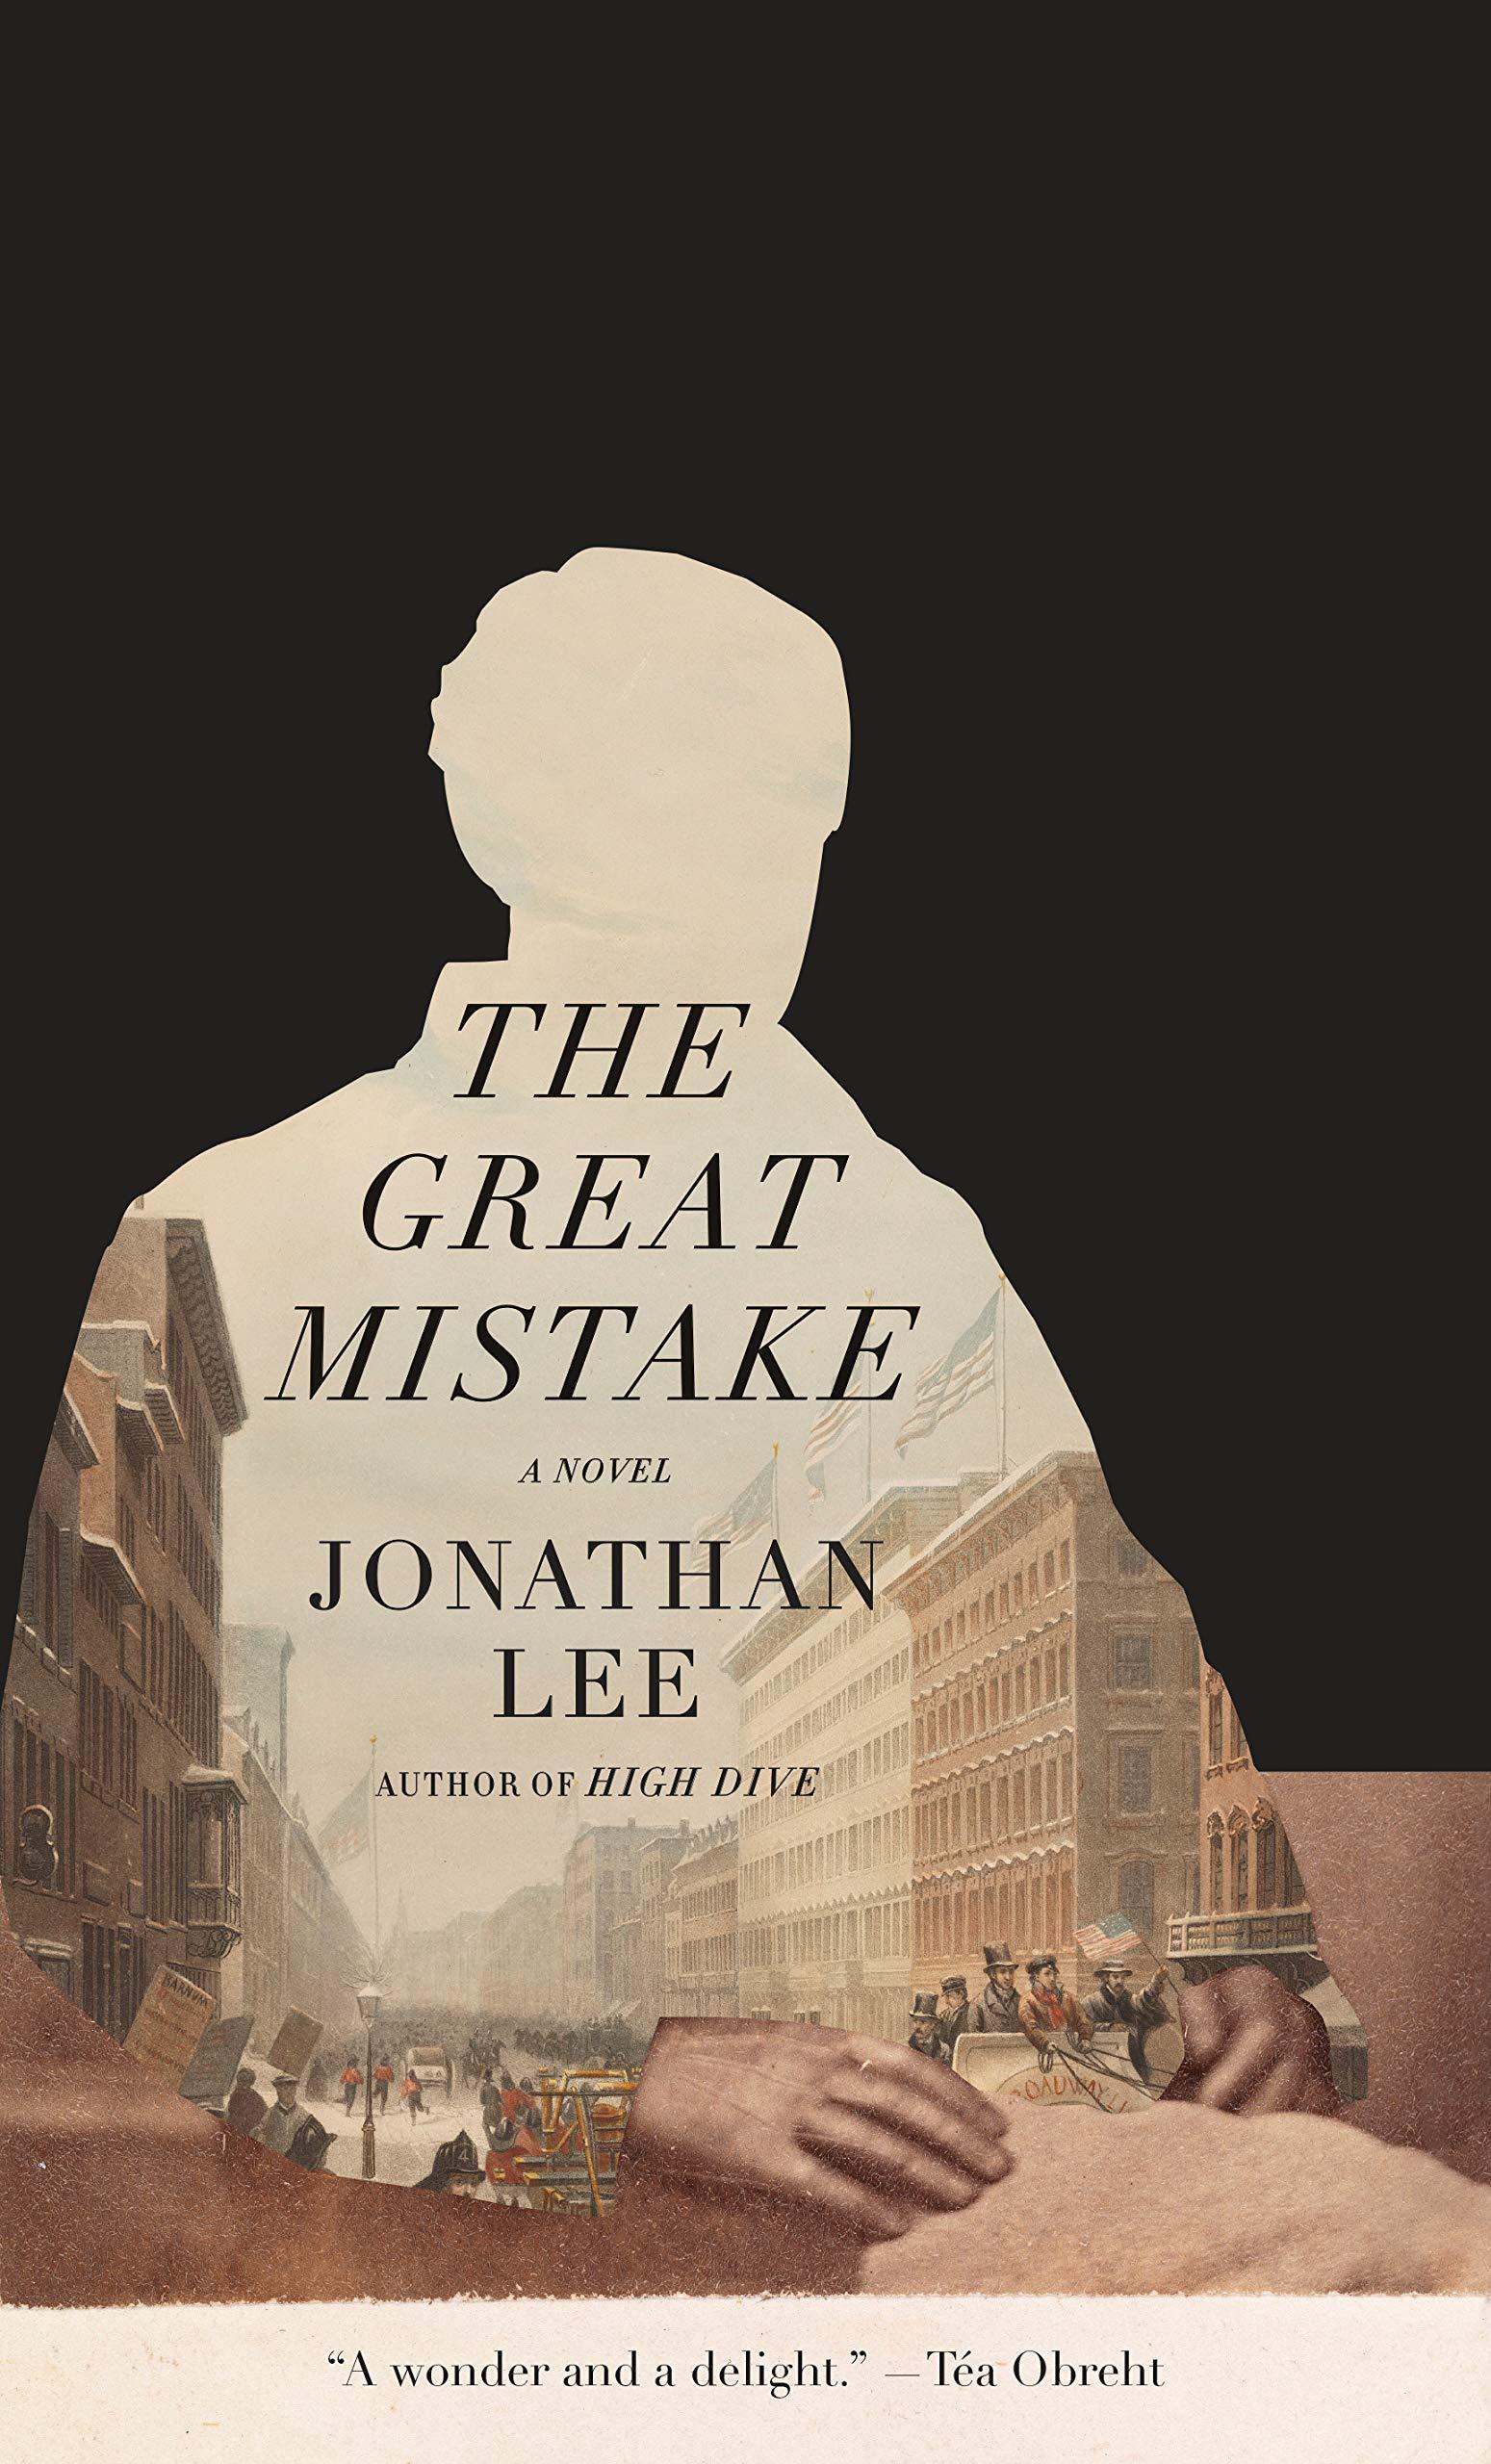 Amazon.com: The Great Mistake: A novel (9780525658498): Lee, Jonathan: Books